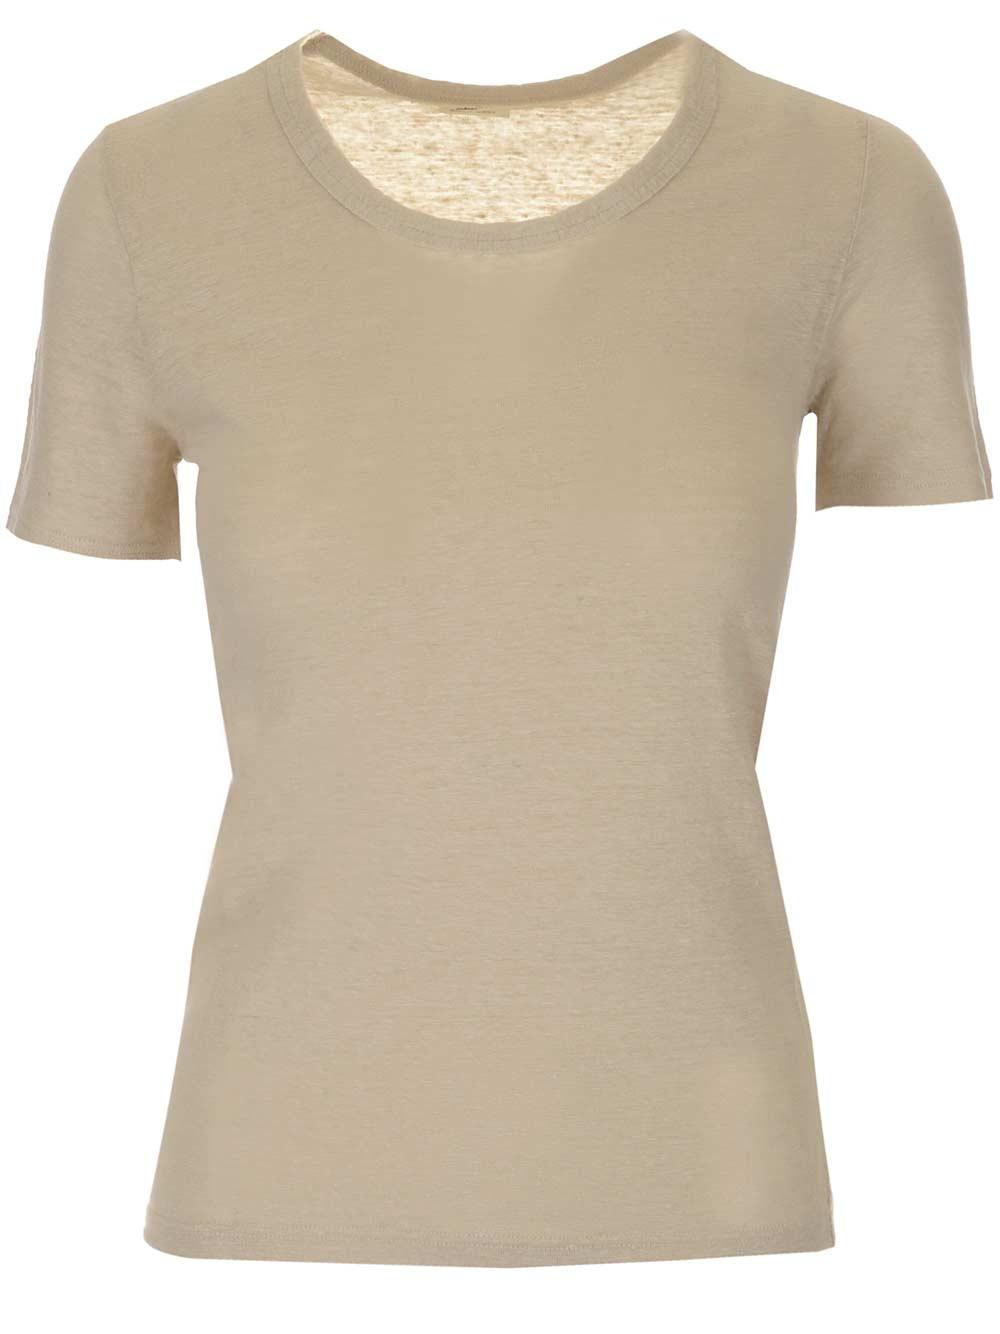 "ISABEL MARANT ETOILE ""Kiliann"" T-Shirt"